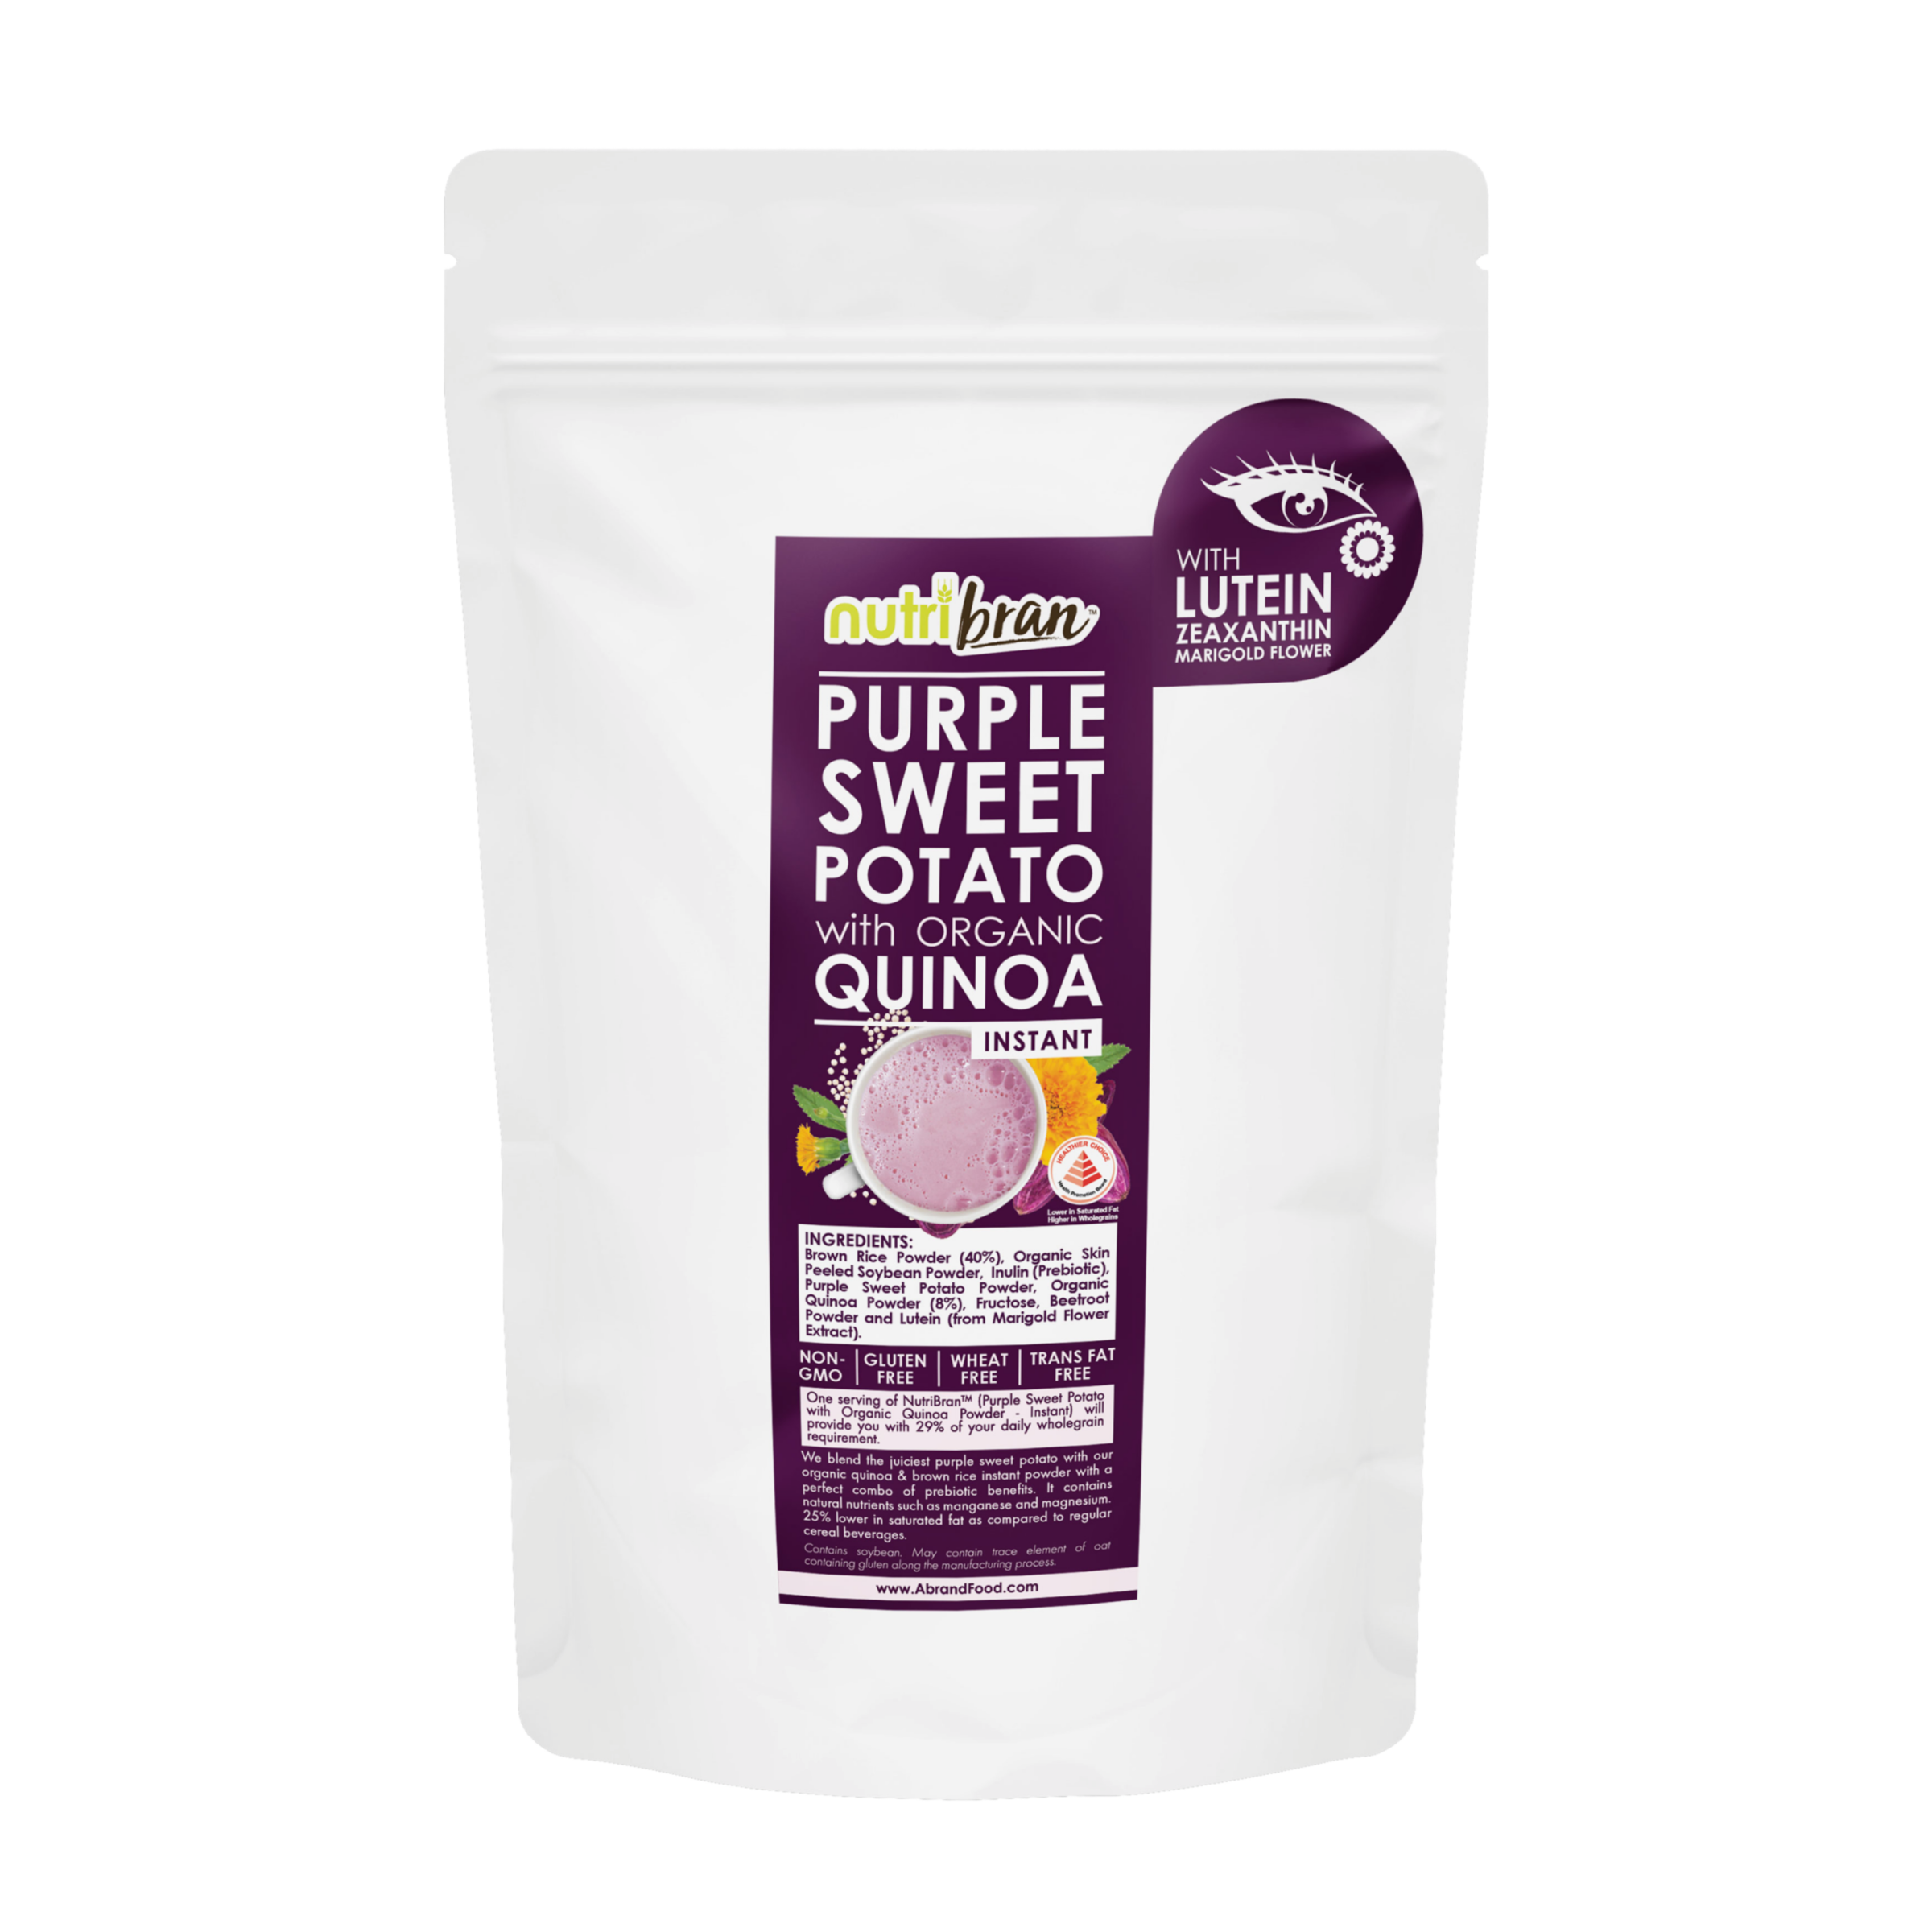 NutriBran(Purple Sweet Potato with Organic Quinoa) - protect eyesight.png